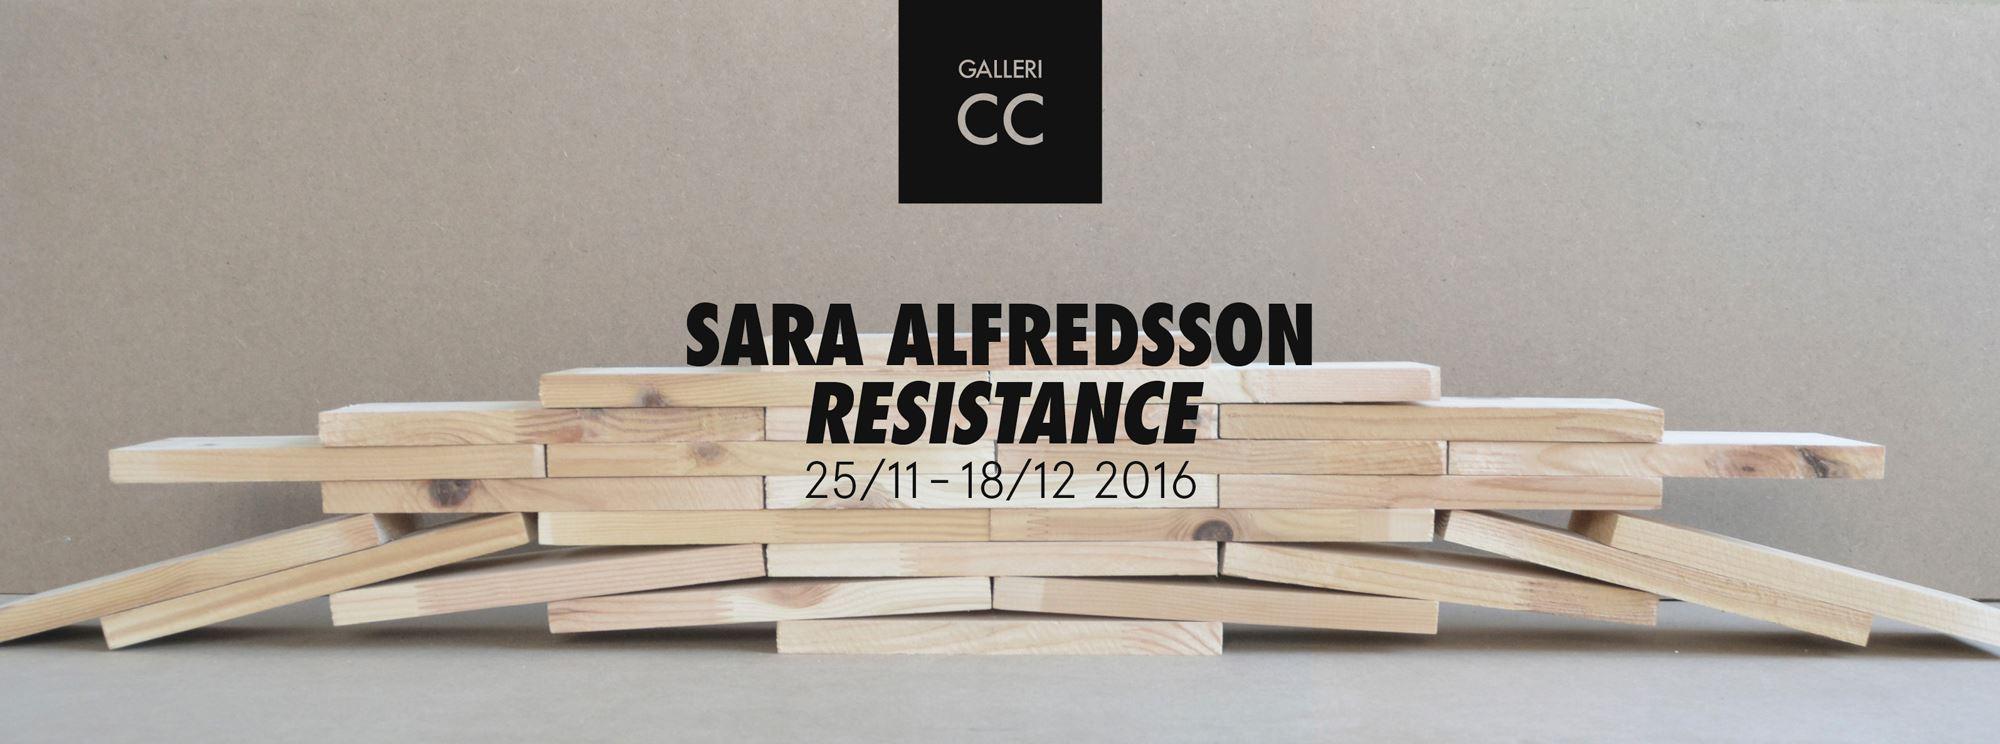 Sara Alfredsson - Resistans